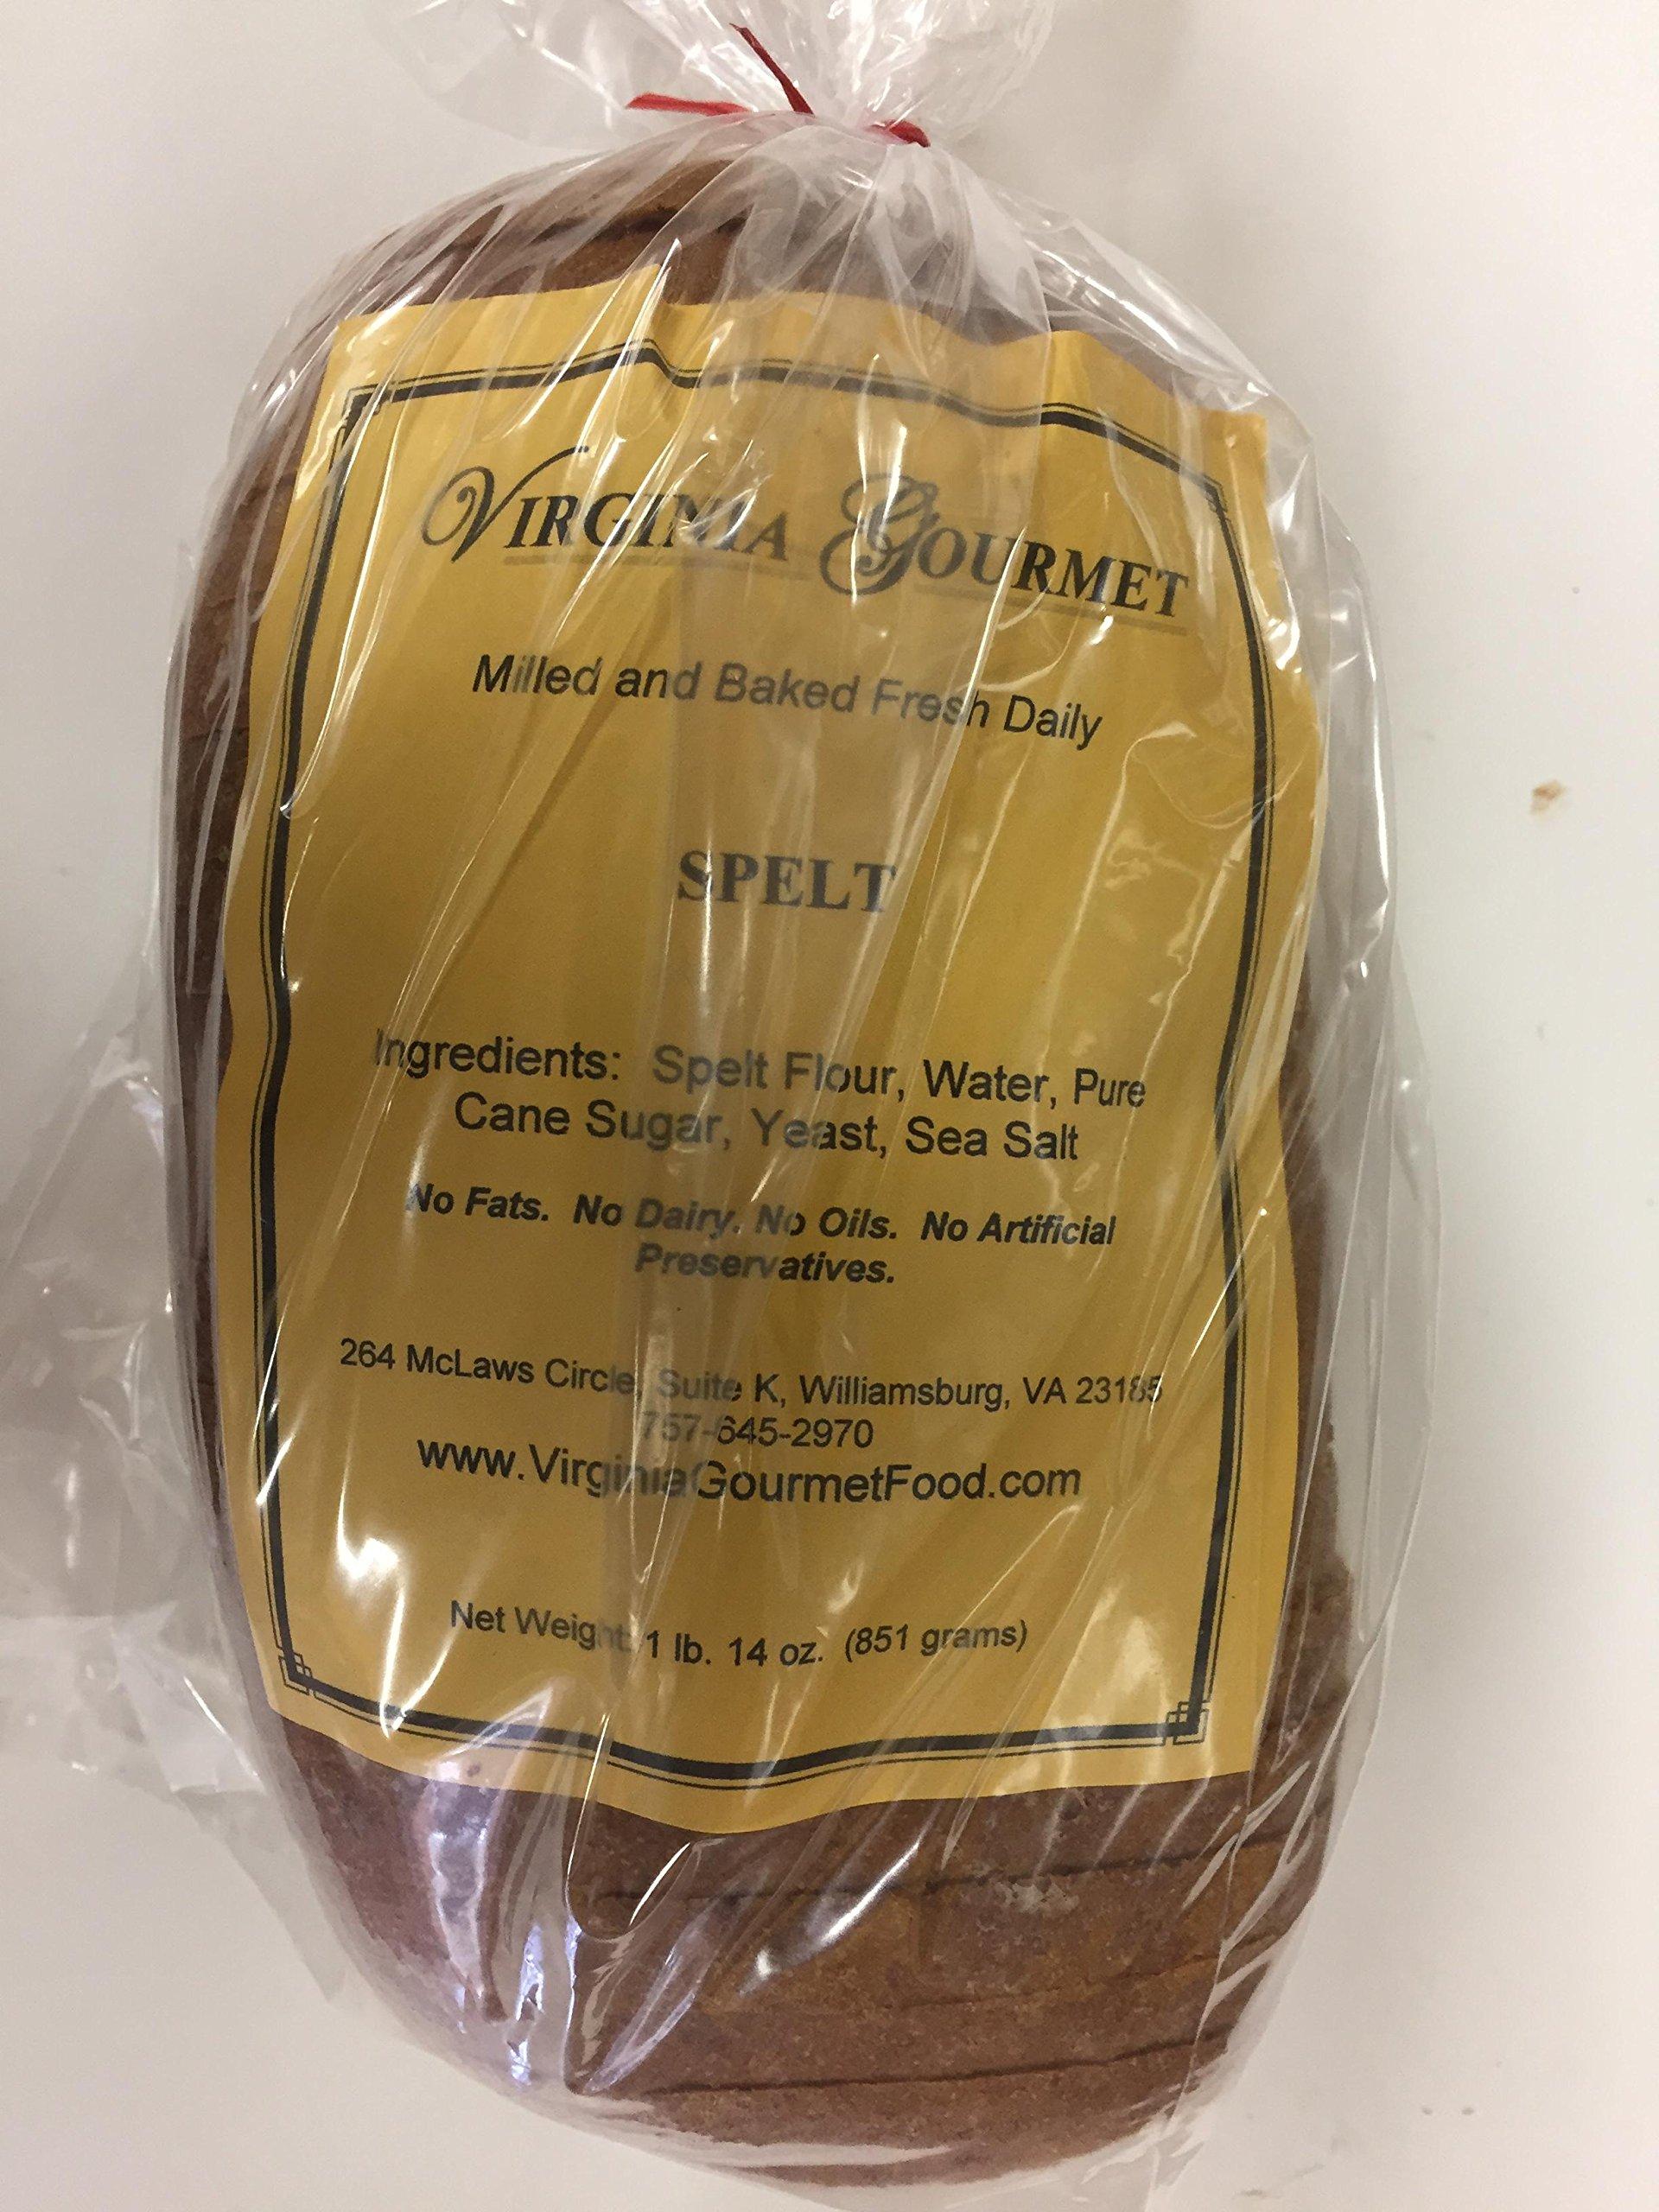 All Natural Spelt Bread (Ezekiel Bread) -2 PACK-Contains Fresh Stone Ground Spelt Flour, Water, Pure Cane Suger, Yeast, Sea Salt